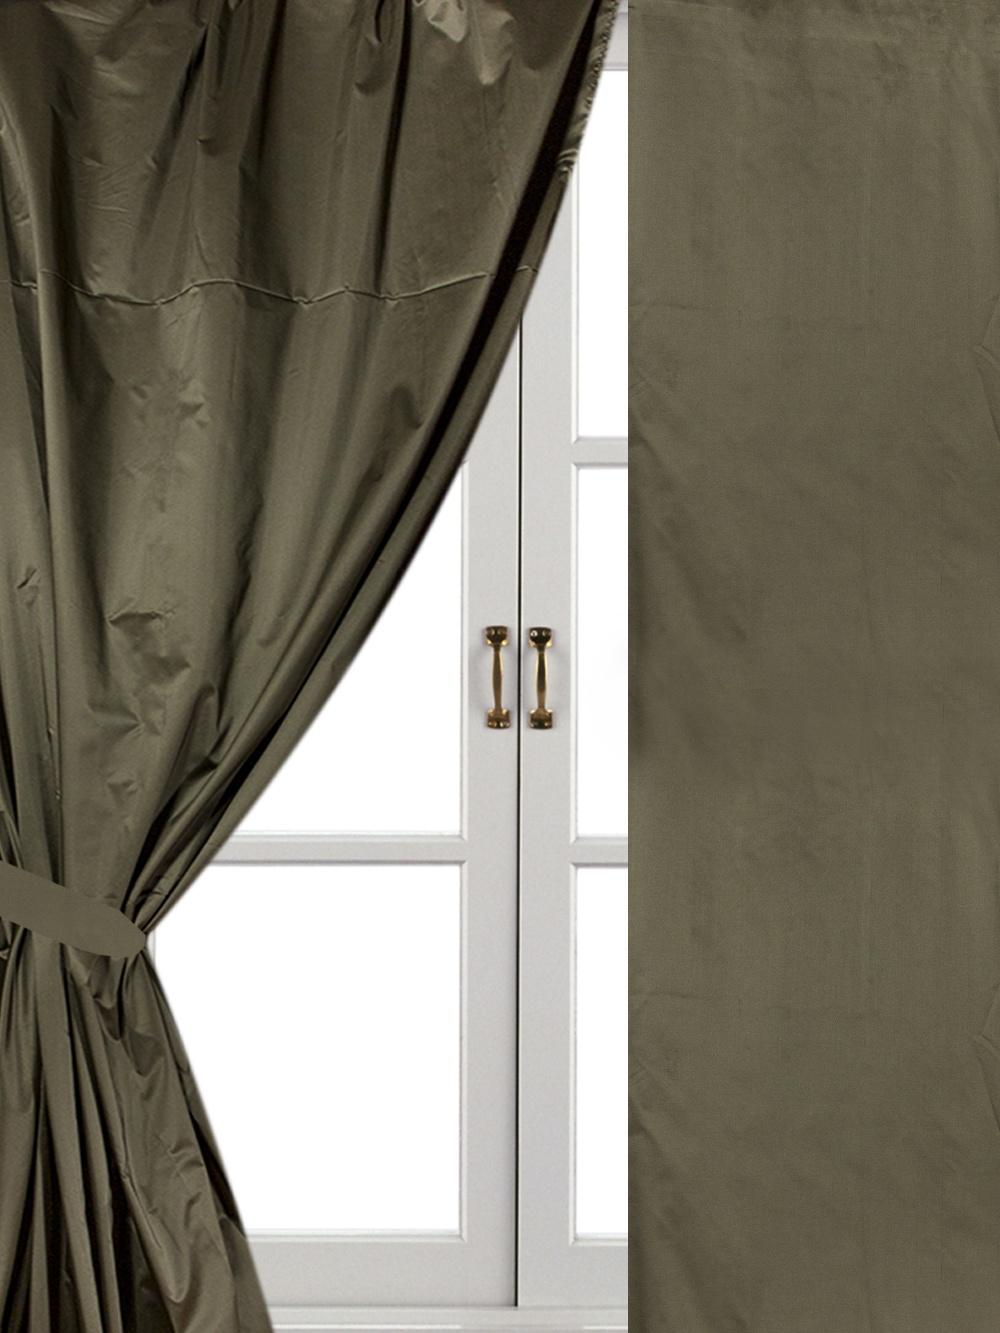 Шторы комнатные Айлант ОБ39 шторы homedeco нитяные шторы яркие кольца